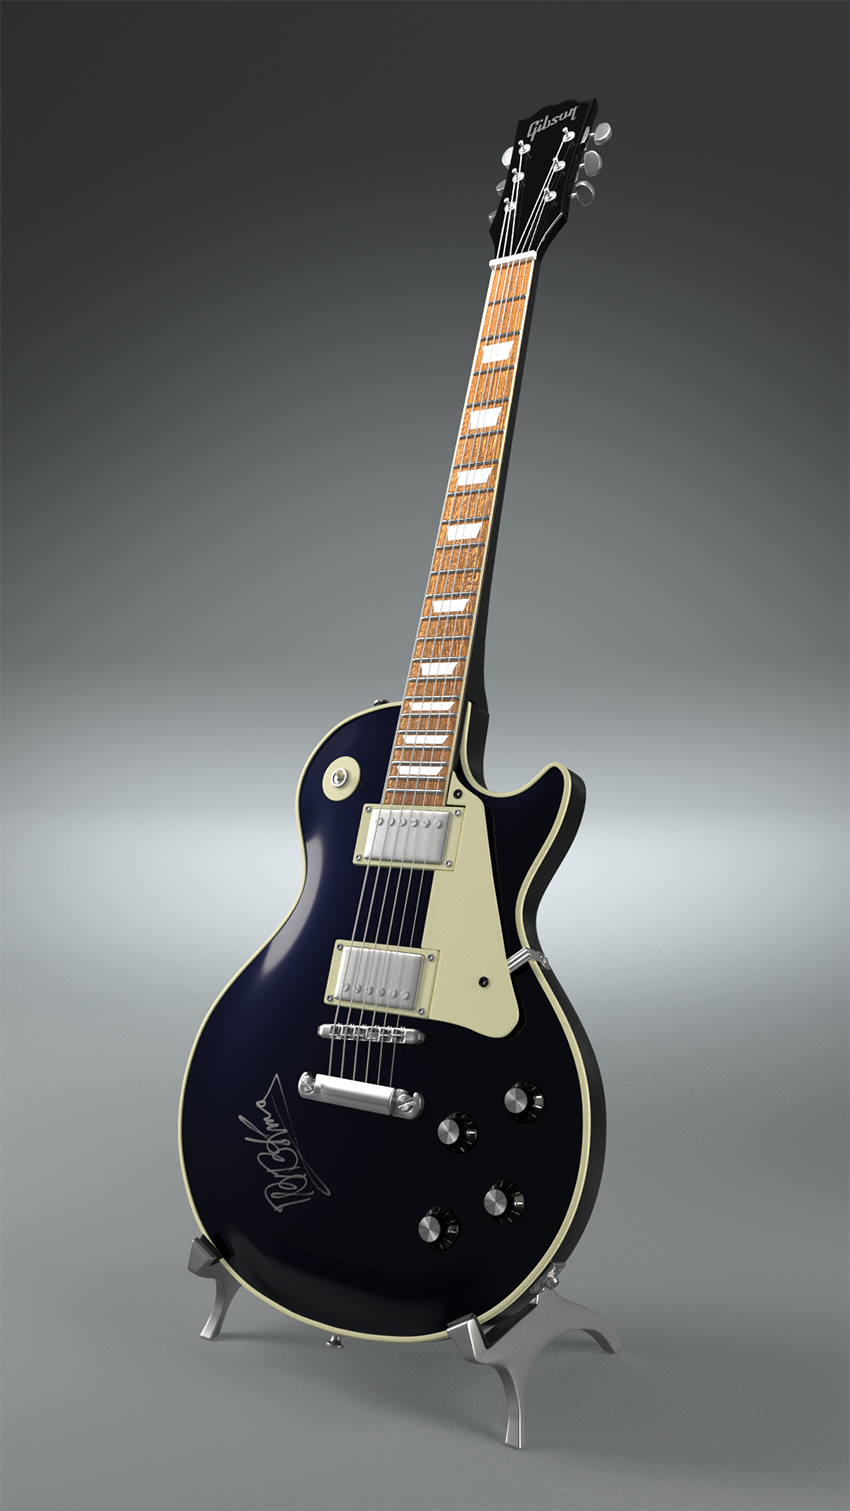 Guitar - Les Paul Gibson